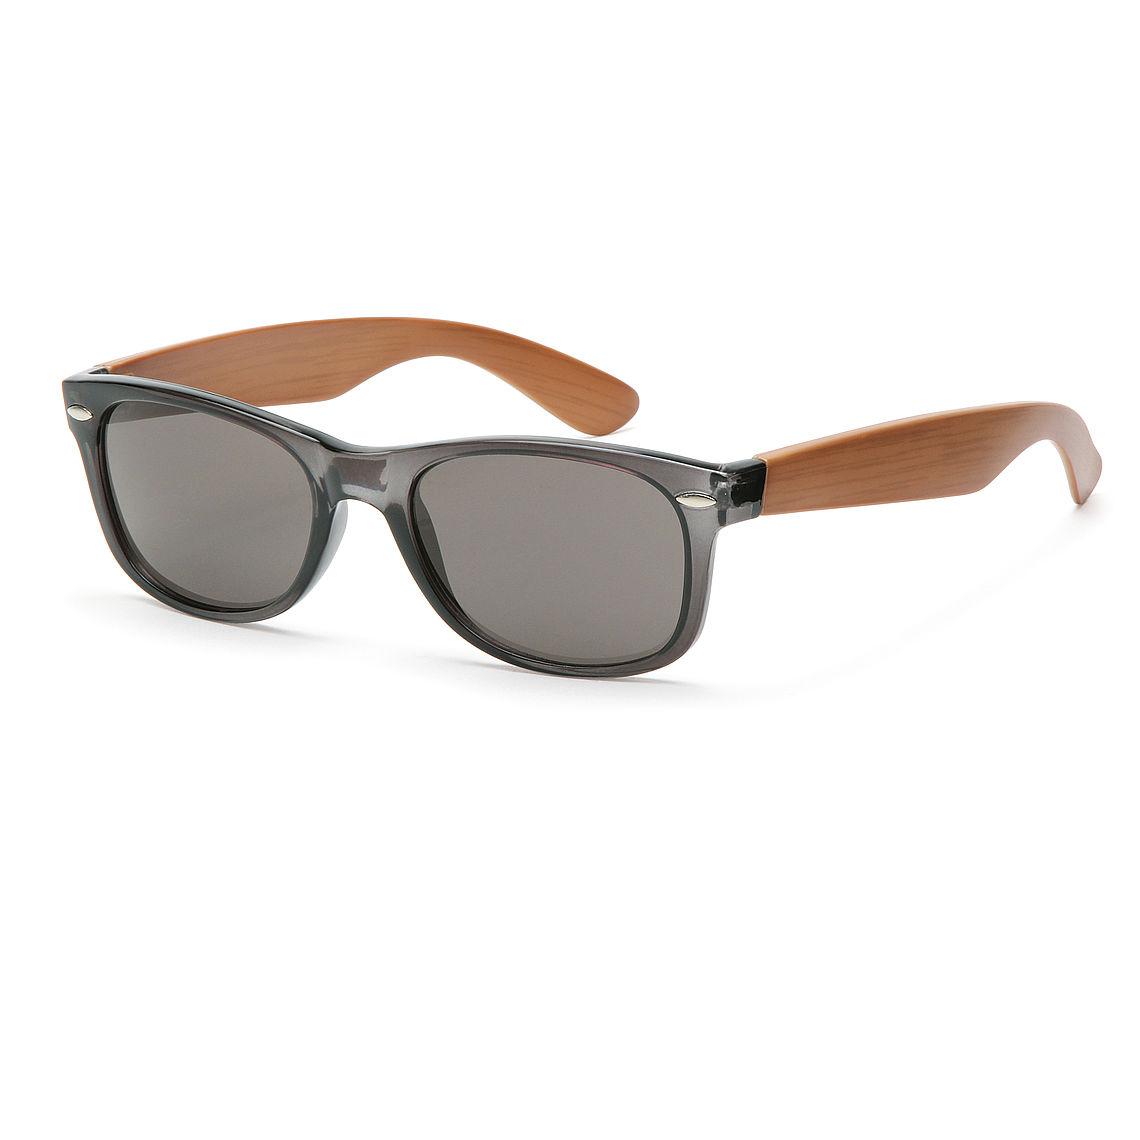 Wayfarer sunglasses 302210 in wood look